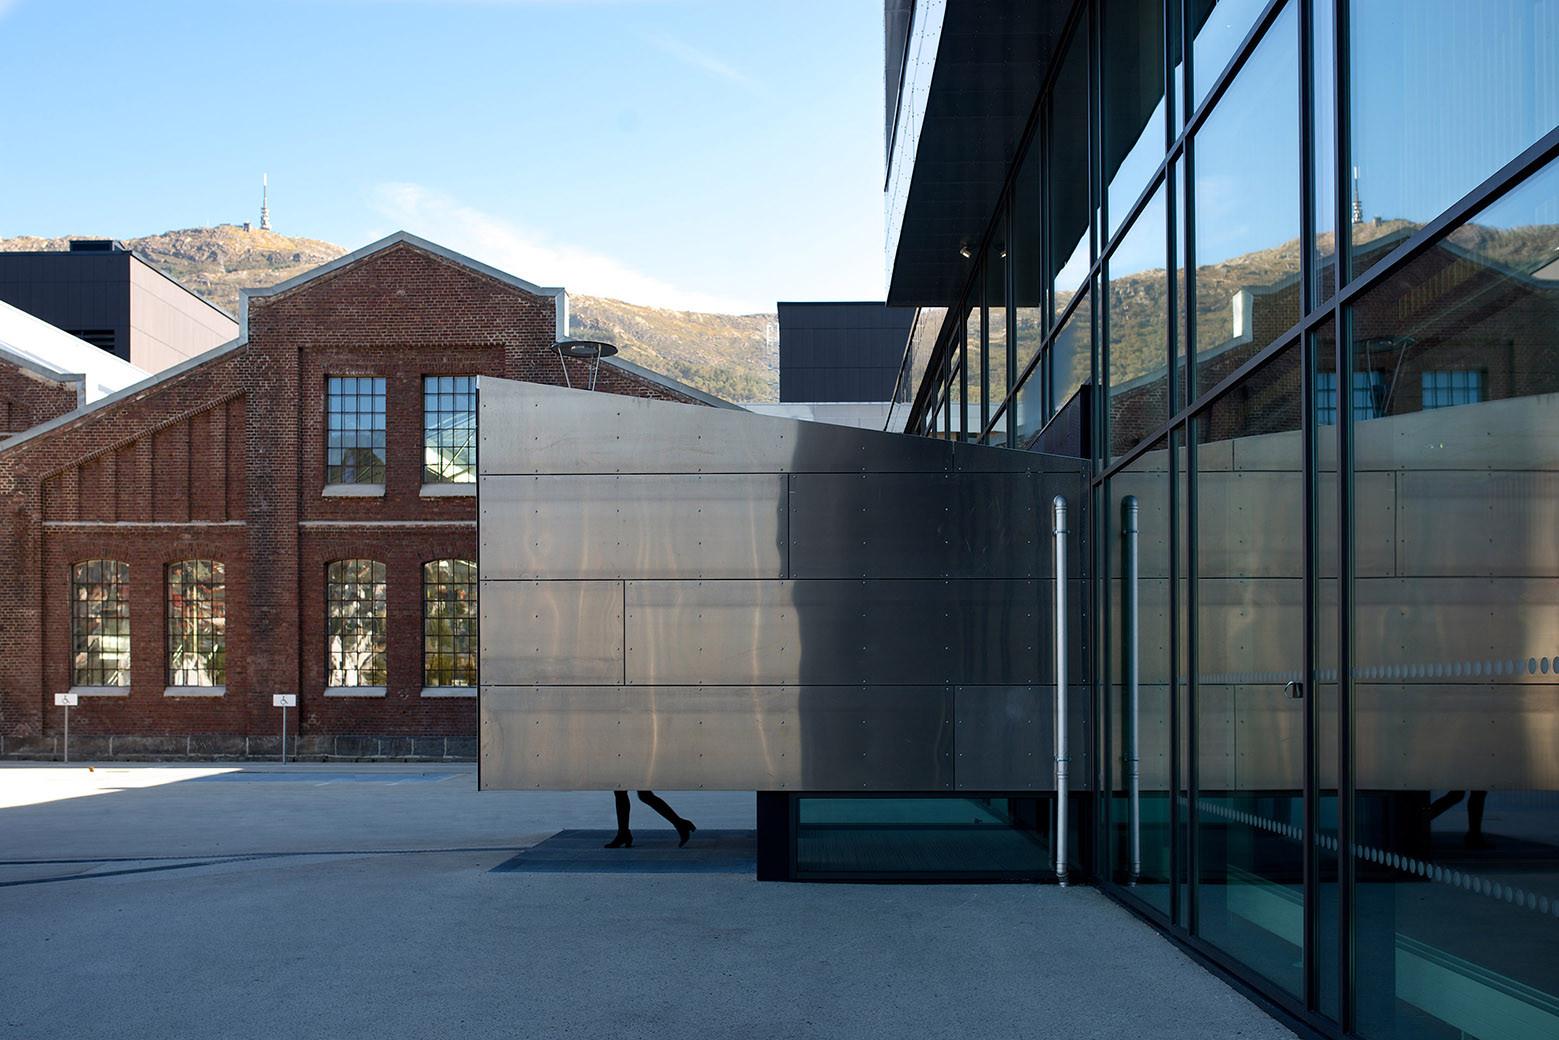 BERGEN UNIVERSITY COLLEGE / CUBO + HLM ARCHITECTURE